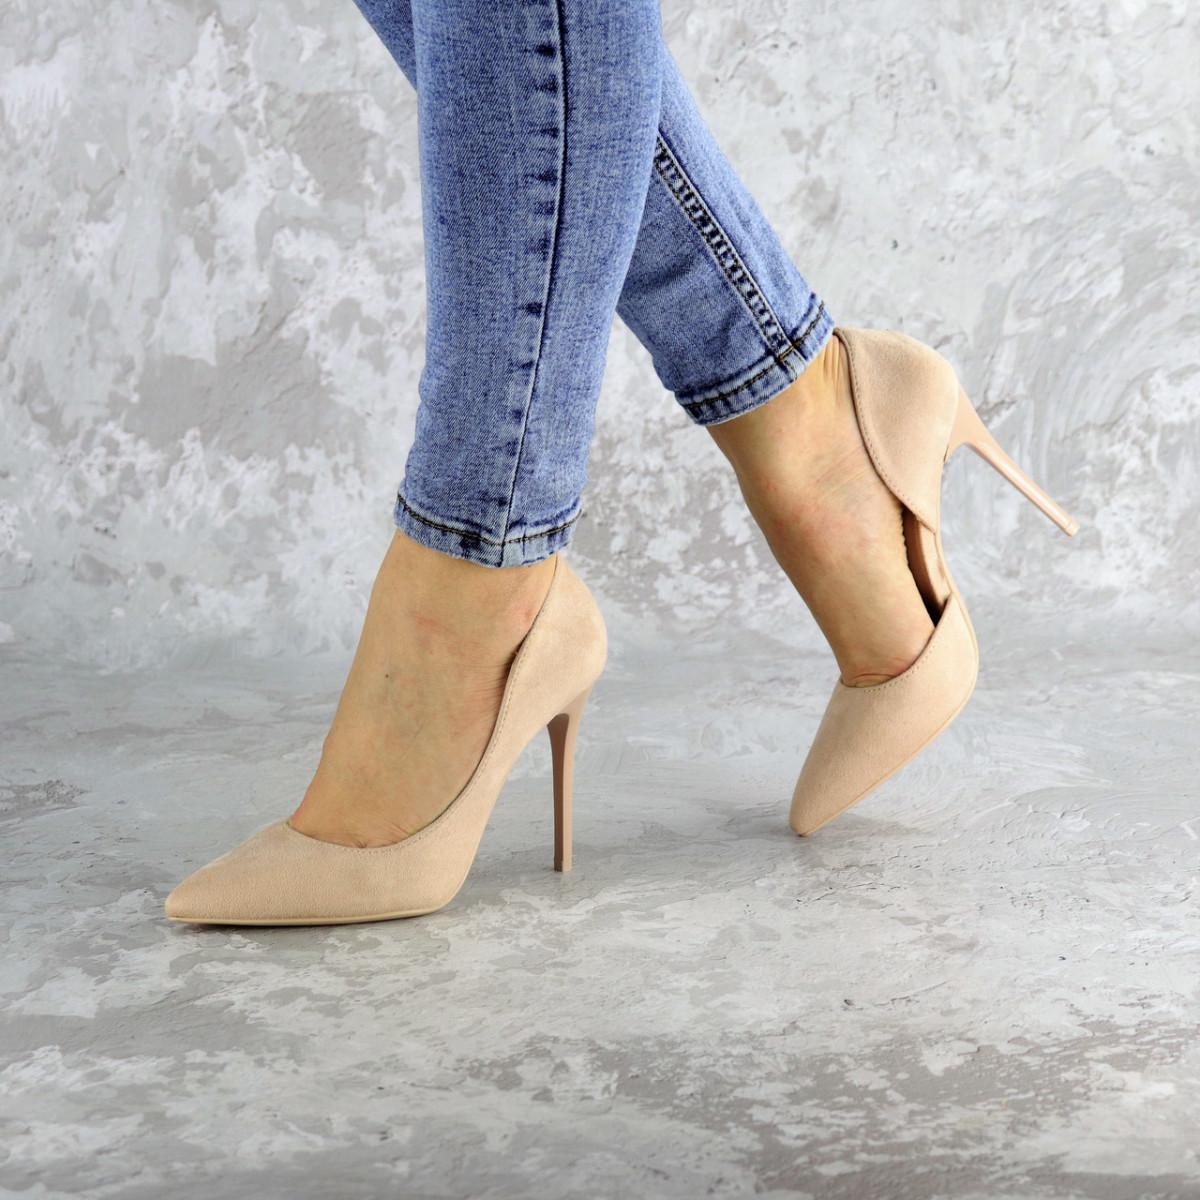 Туфли женские Fashion Vassel 2452 36 размер 23 см Бежевый